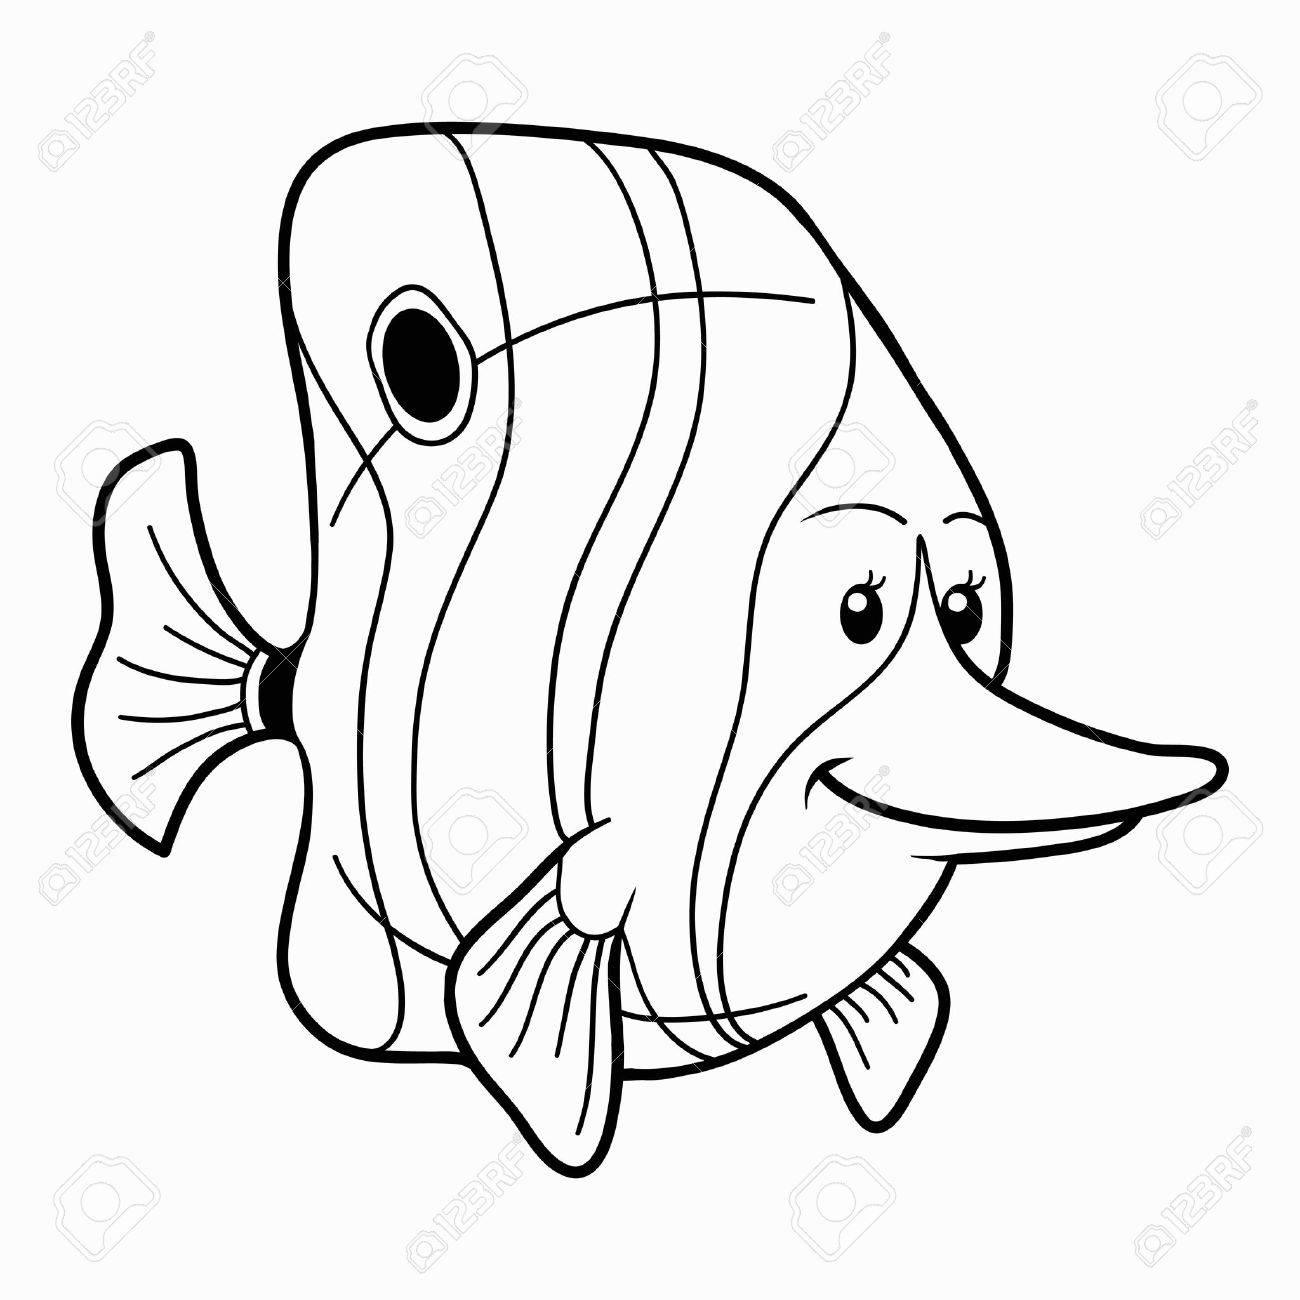 Coloring Book Fish Stock Vector